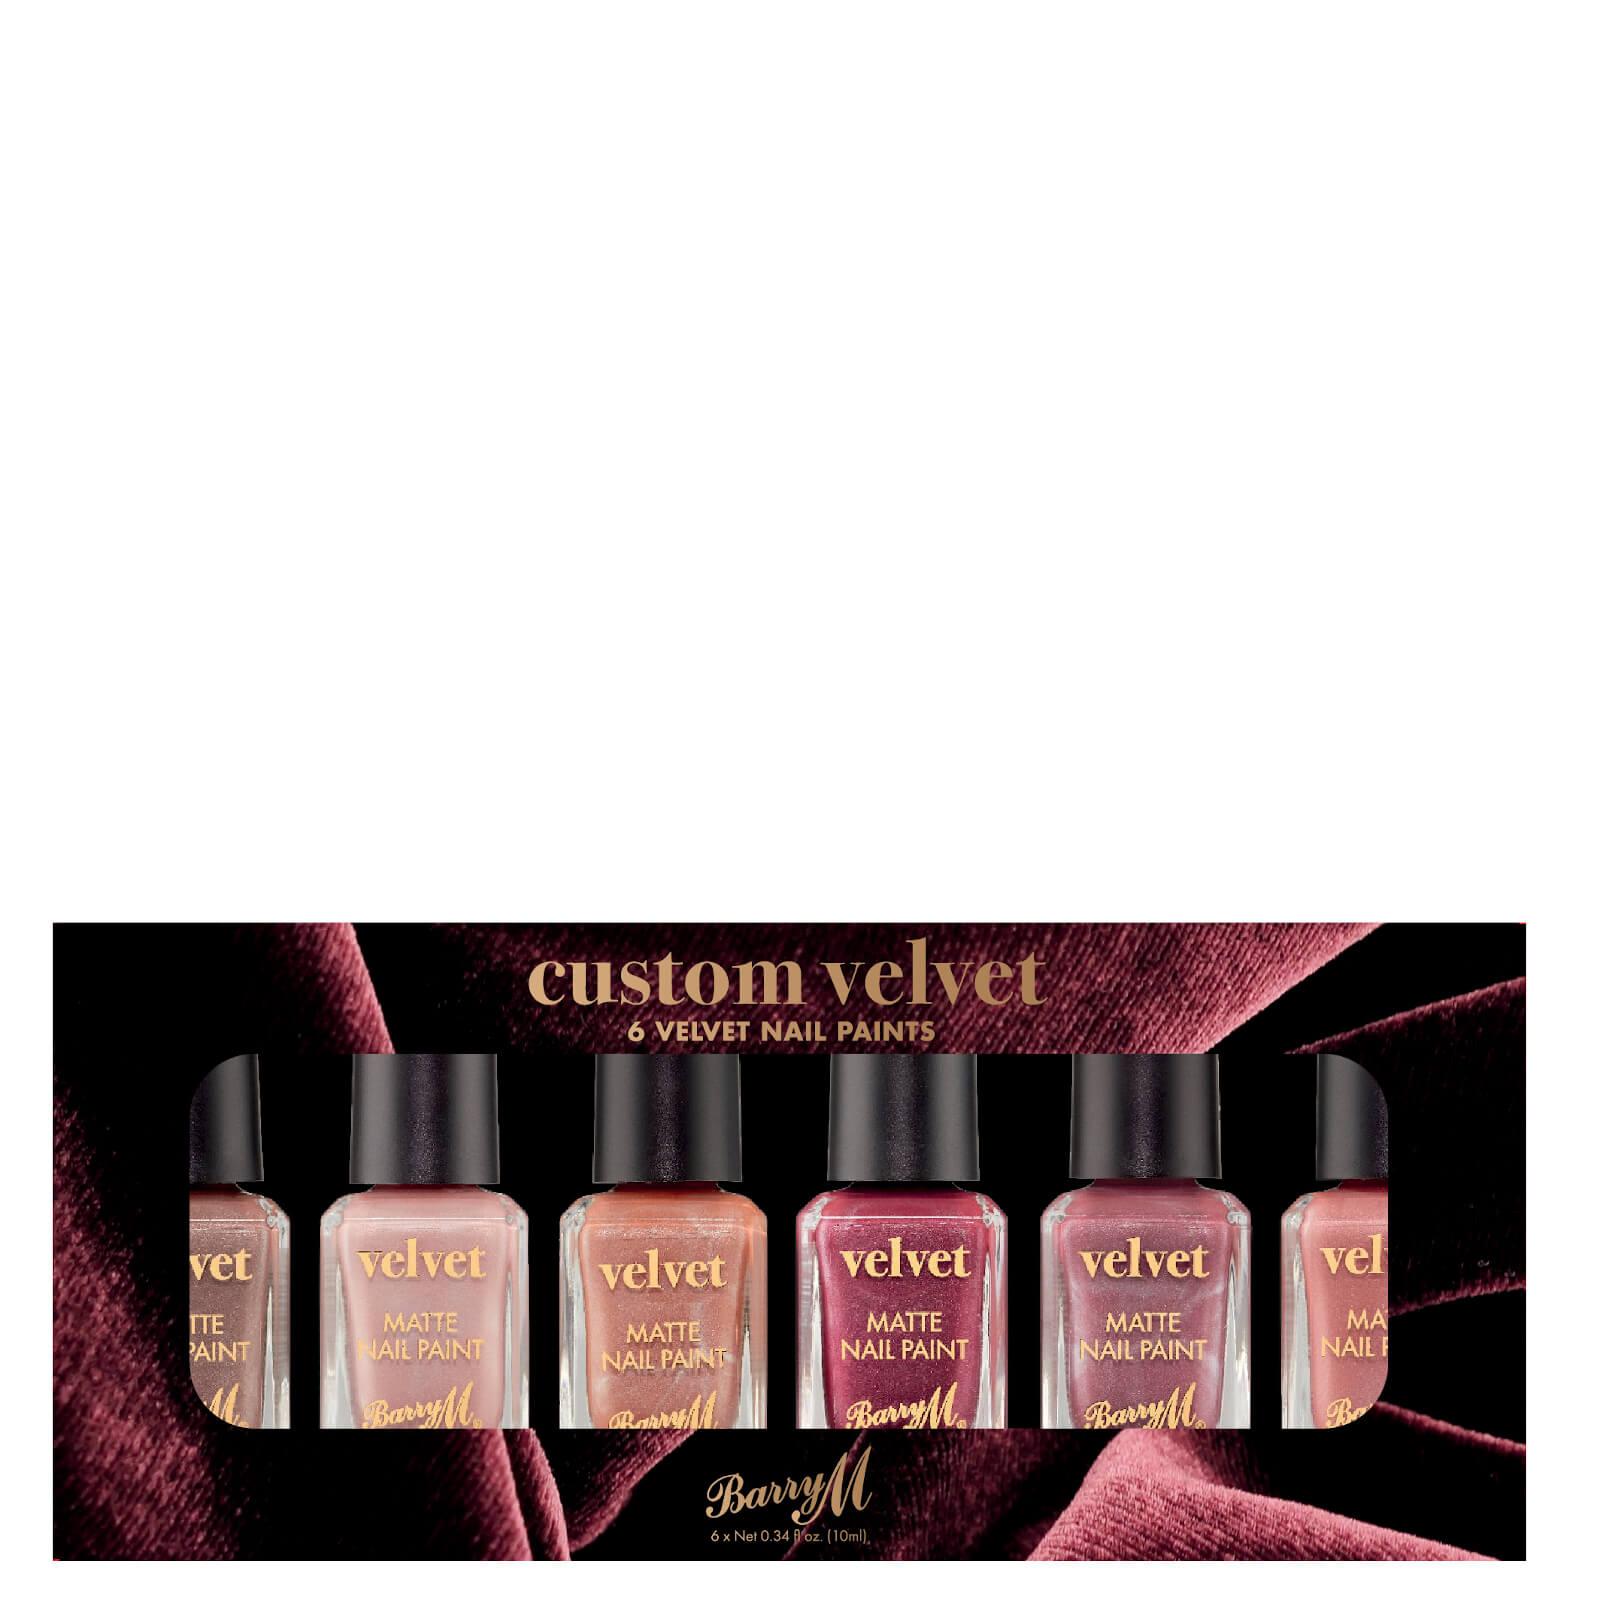 Купить Barry M Cosmetics Nail Paint Gift Set - Custom Velvet